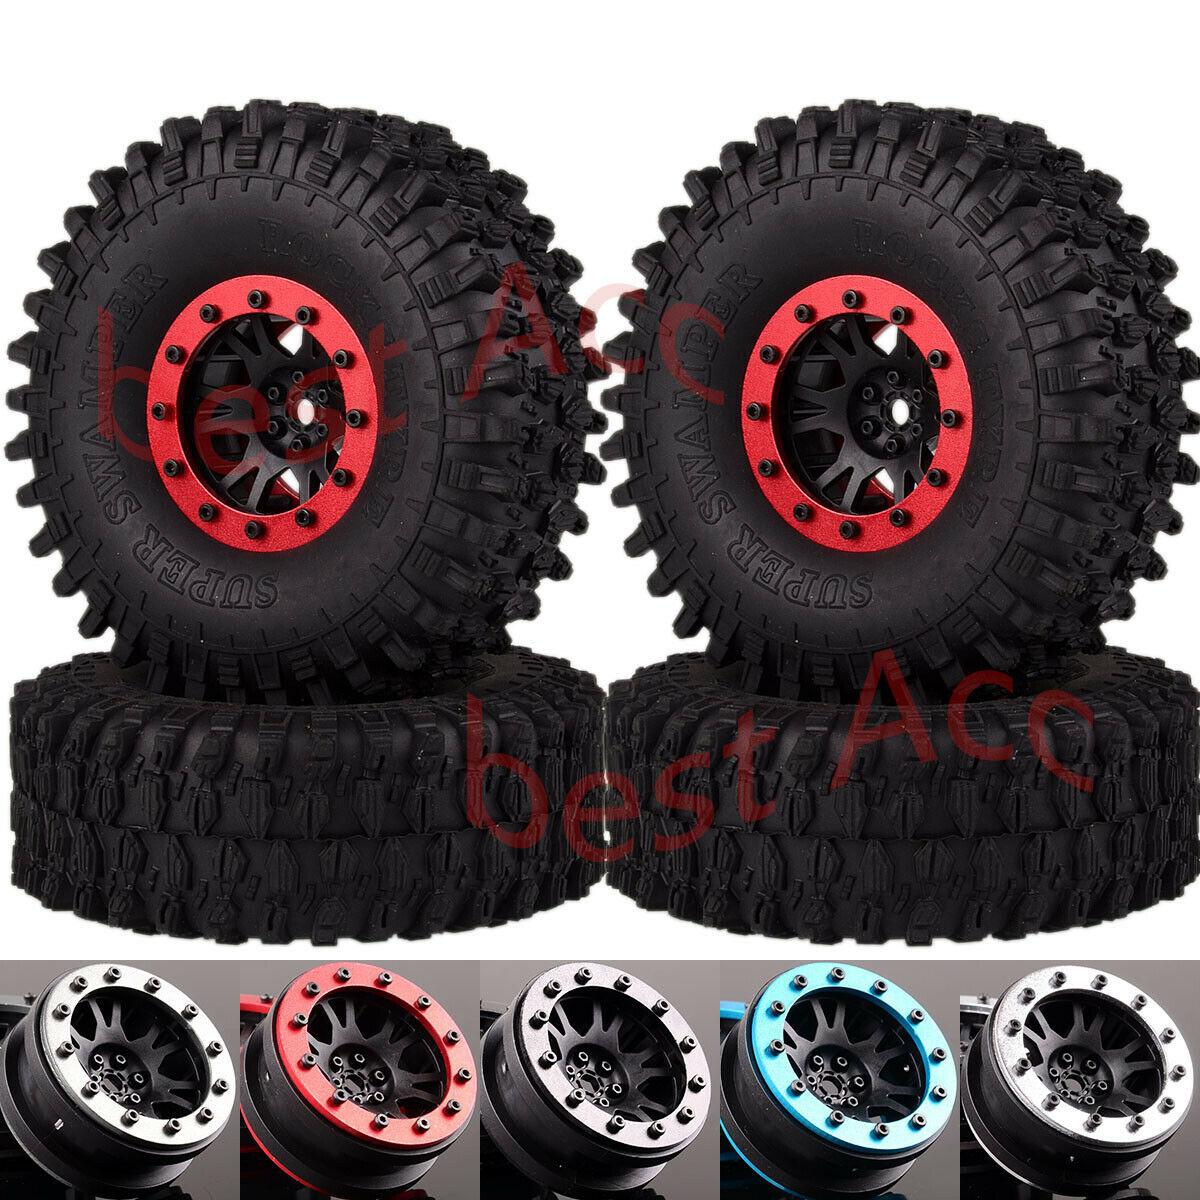 1068-7037 RC Car Beadlock Wheel Rim Tires 1.9 For 1:10 Crawler 90047 D110 TF2 TRX4 4P rc car 4wd1068-7037 RC Car Beadlock Wheel Rim Tires 1.9 For 1:10 Crawler 90047 D110 TF2 TRX4 4P rc car 4wd